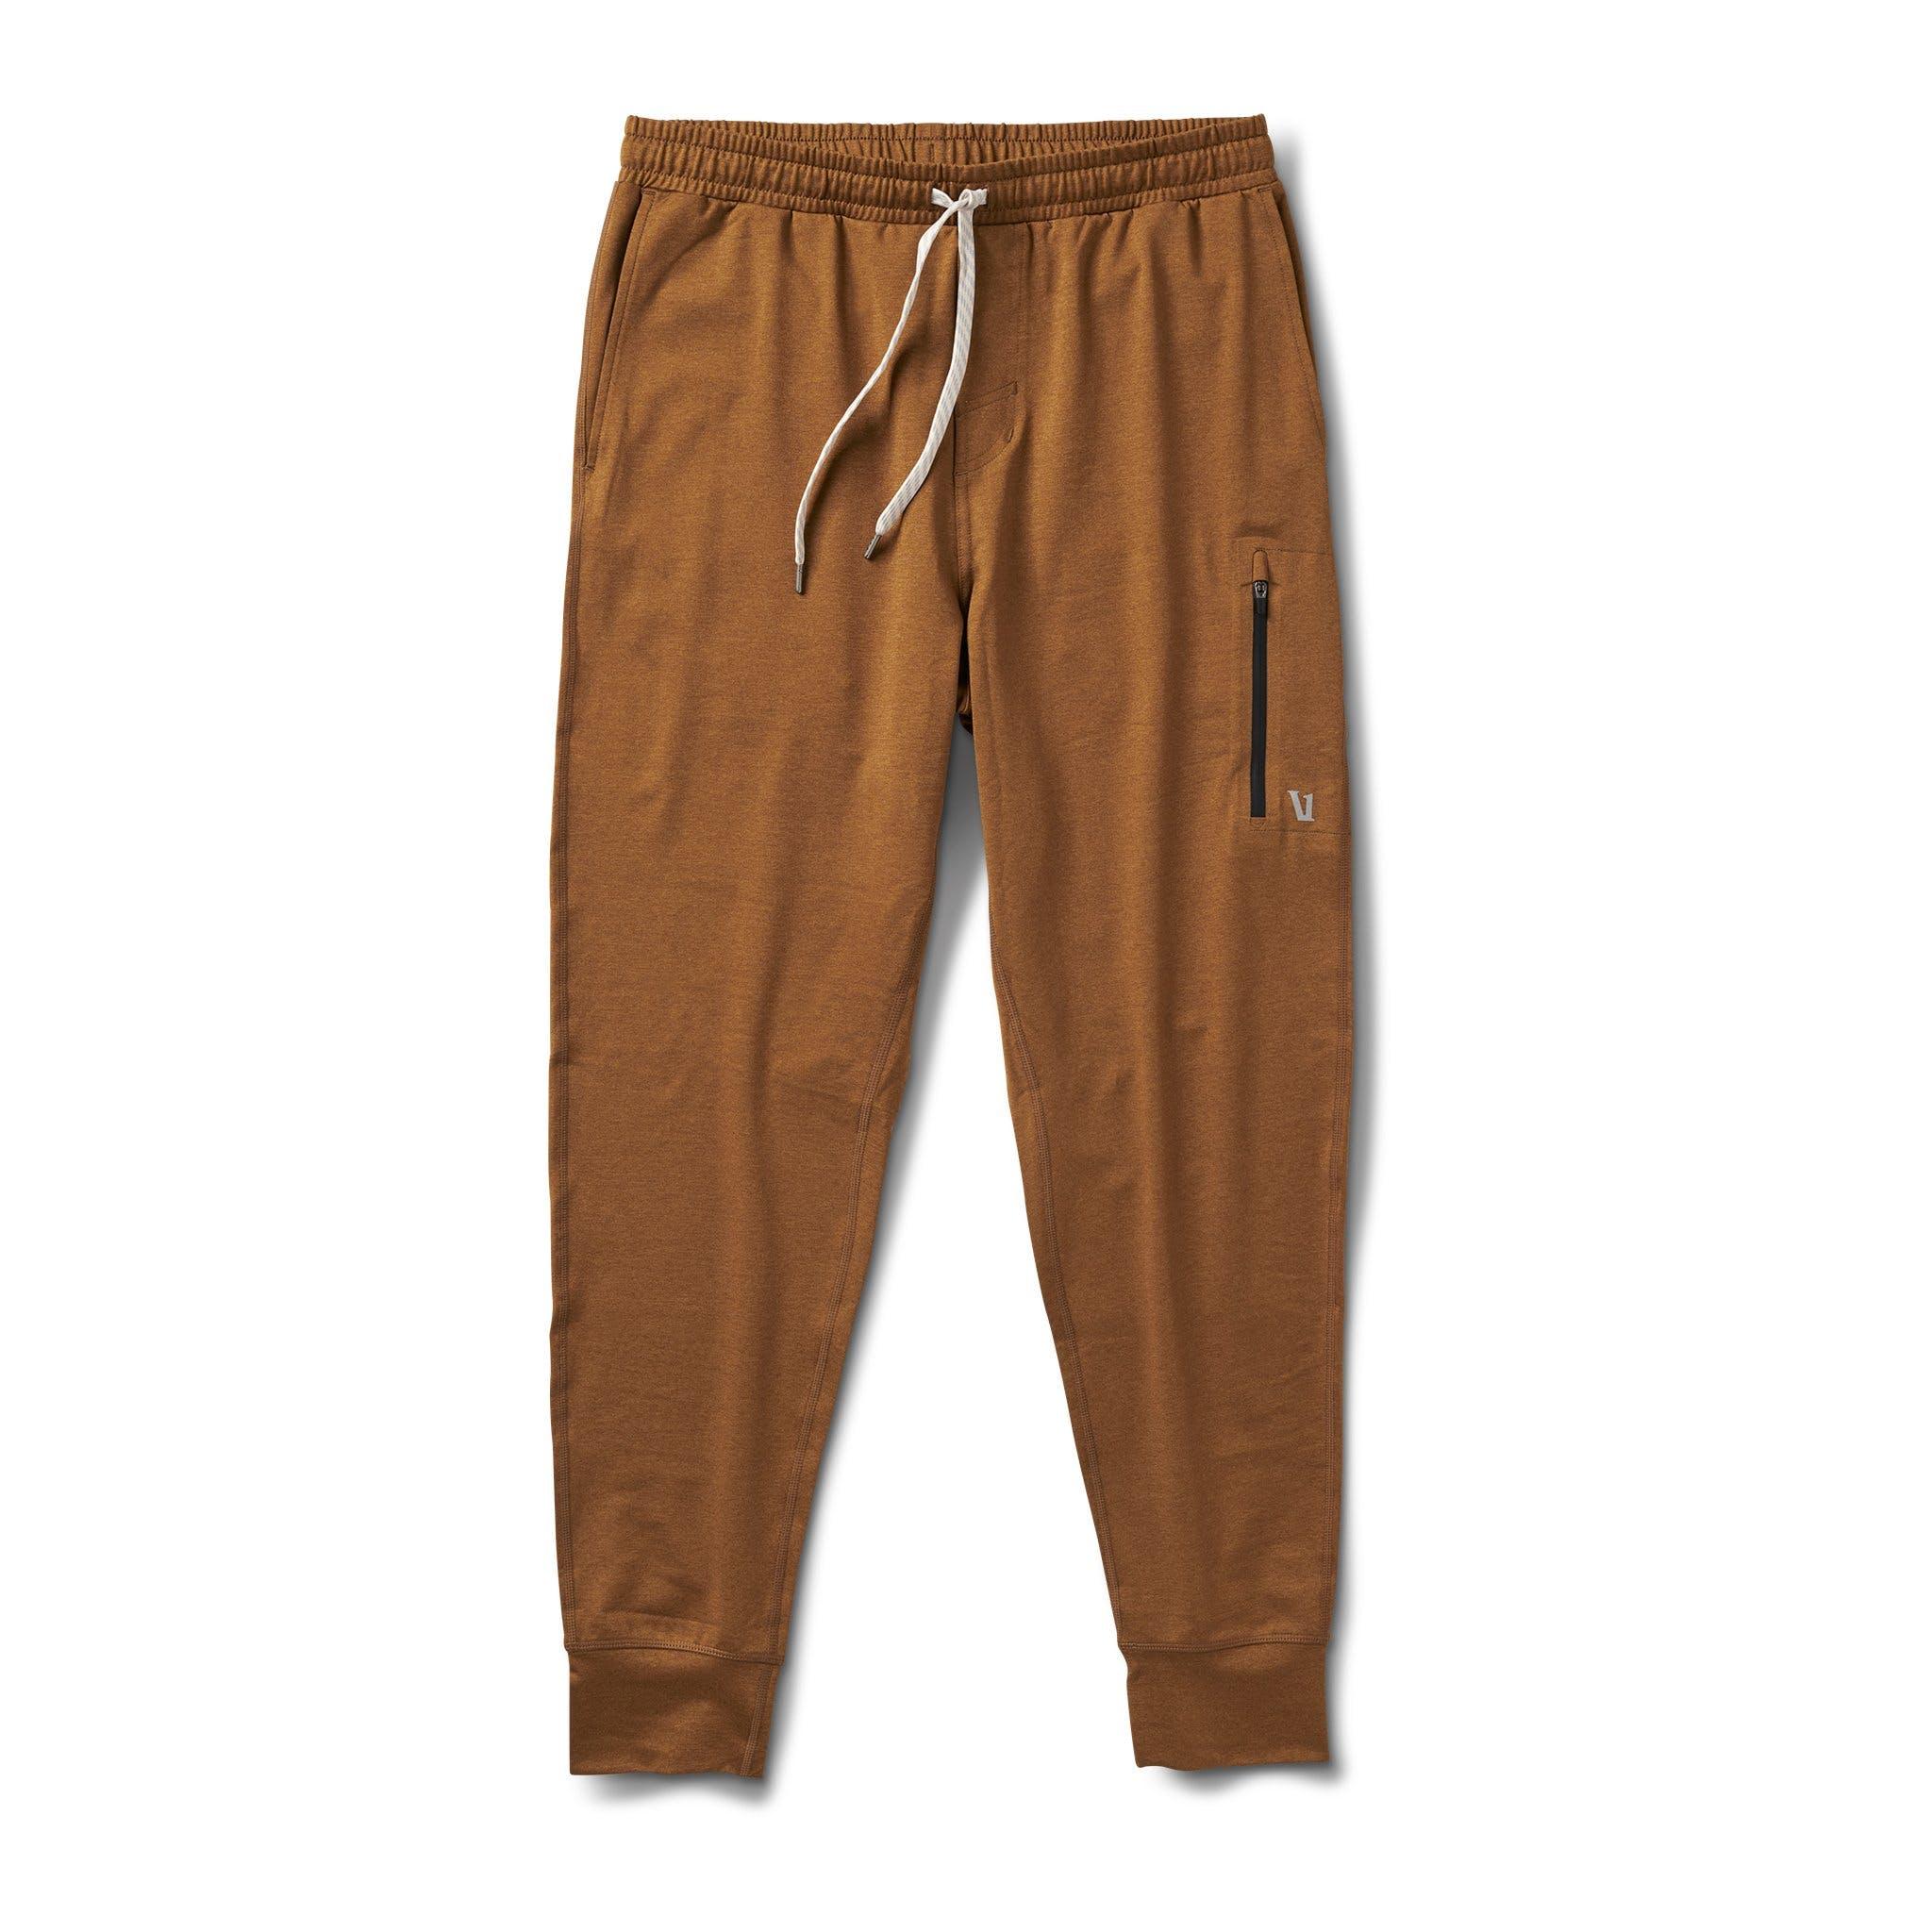 Vuori Sunday Performance Joggers in light tobacco brown; best men's loungewear